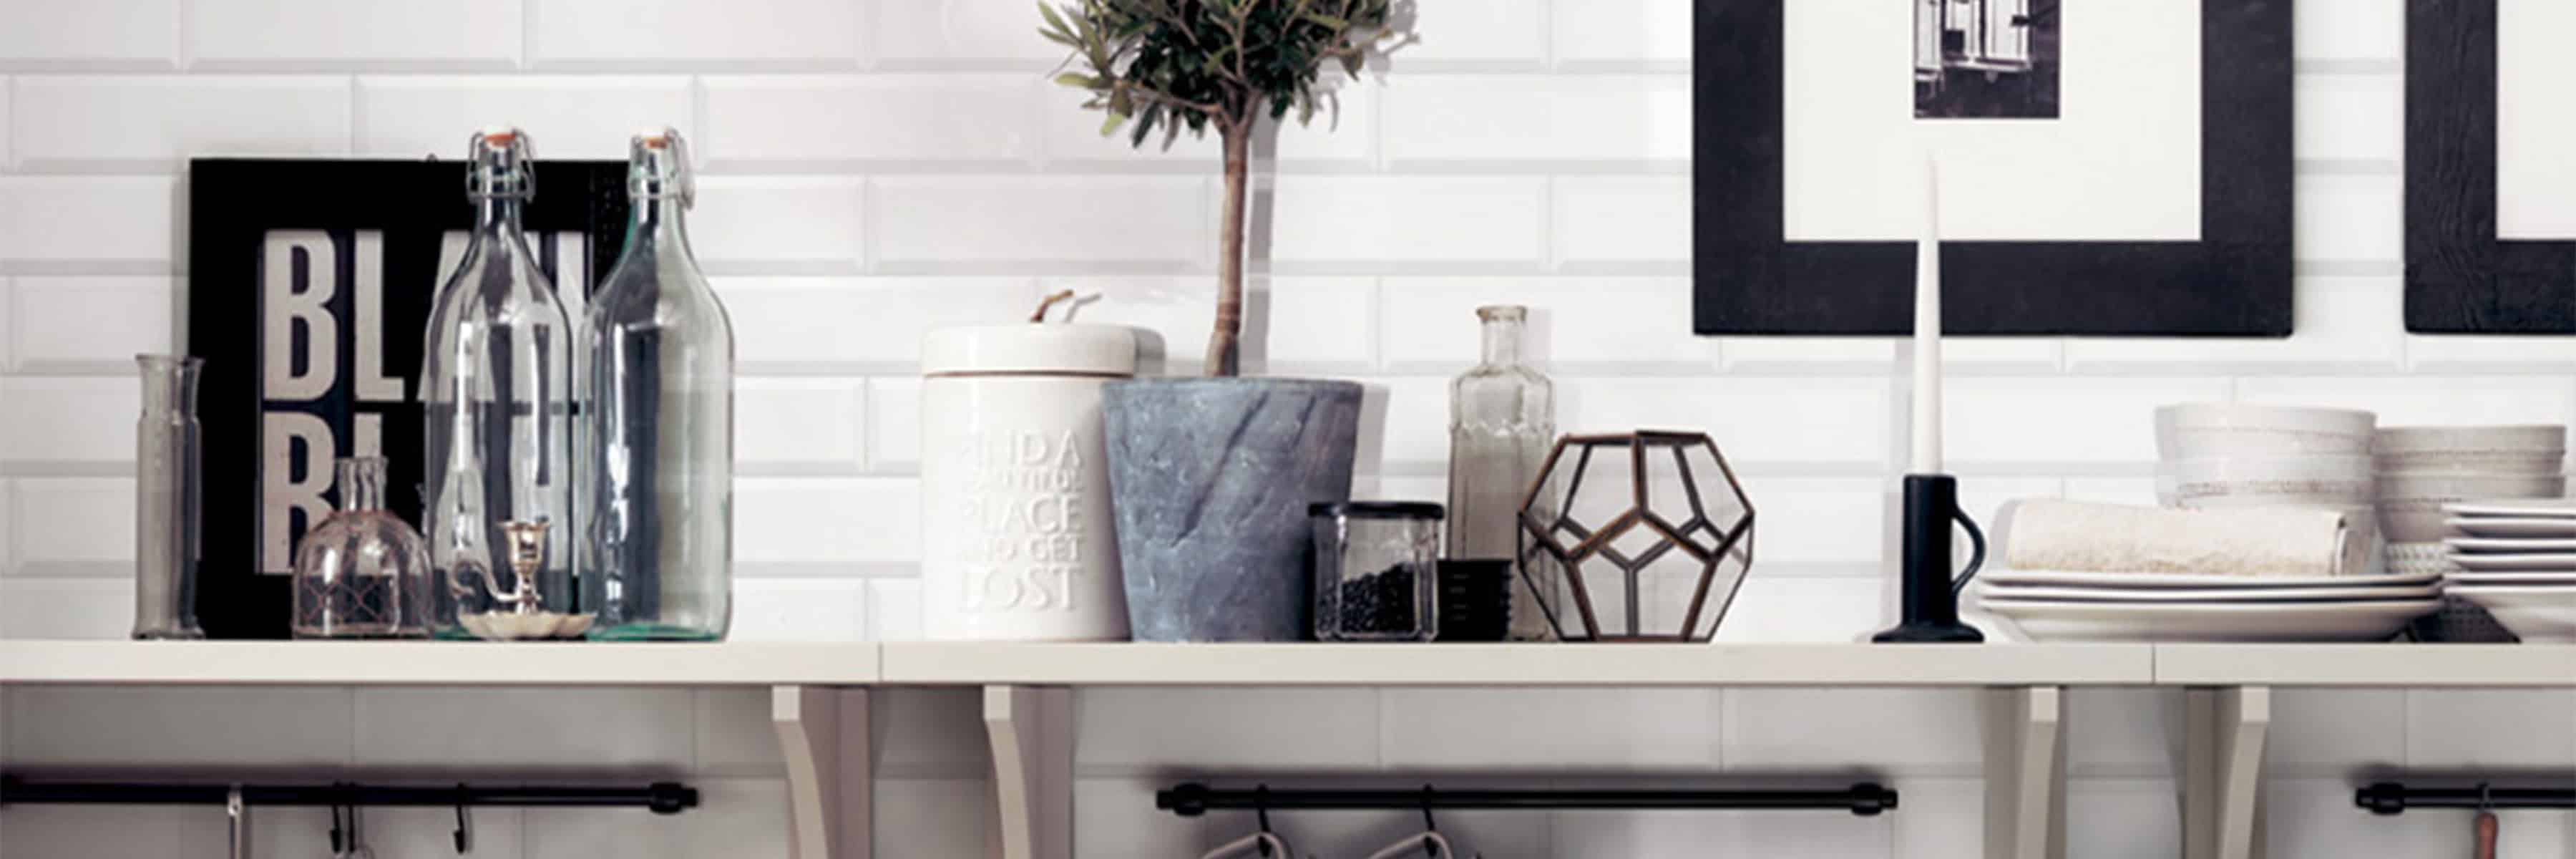 Brick_103_03_Bevel-White.jpg